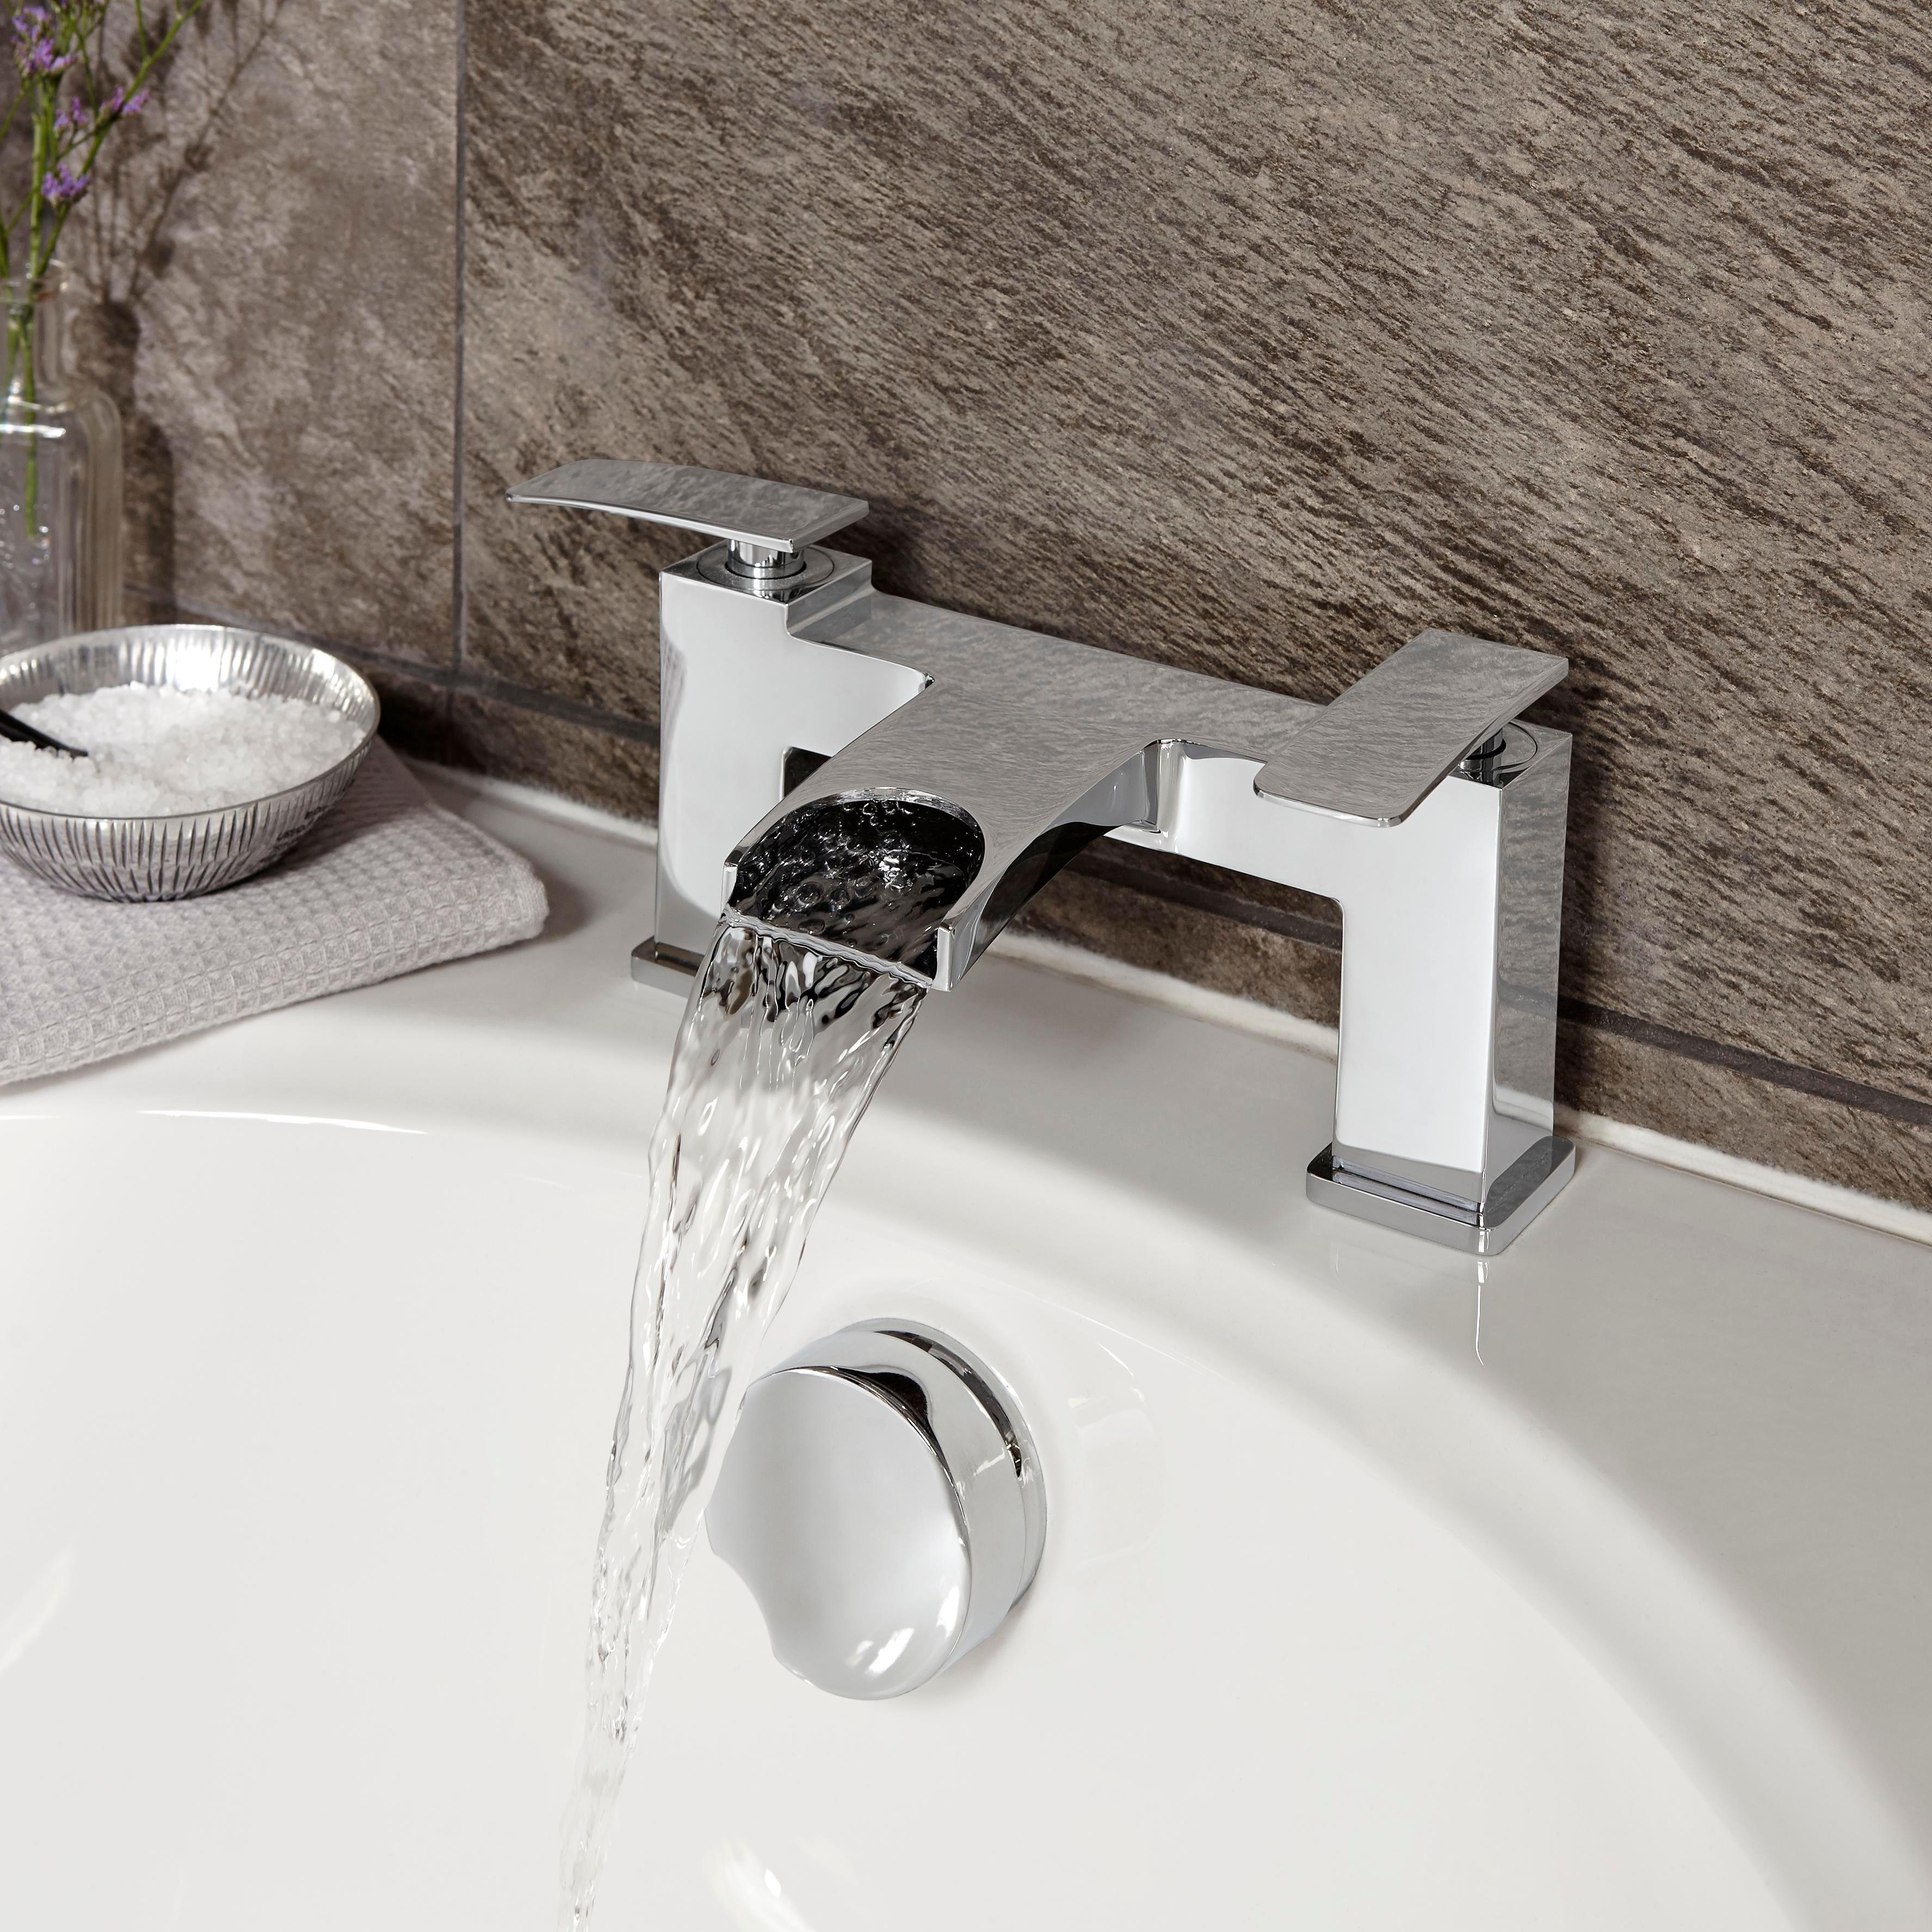 bath taps waterfall bathroom taps KACNMCE